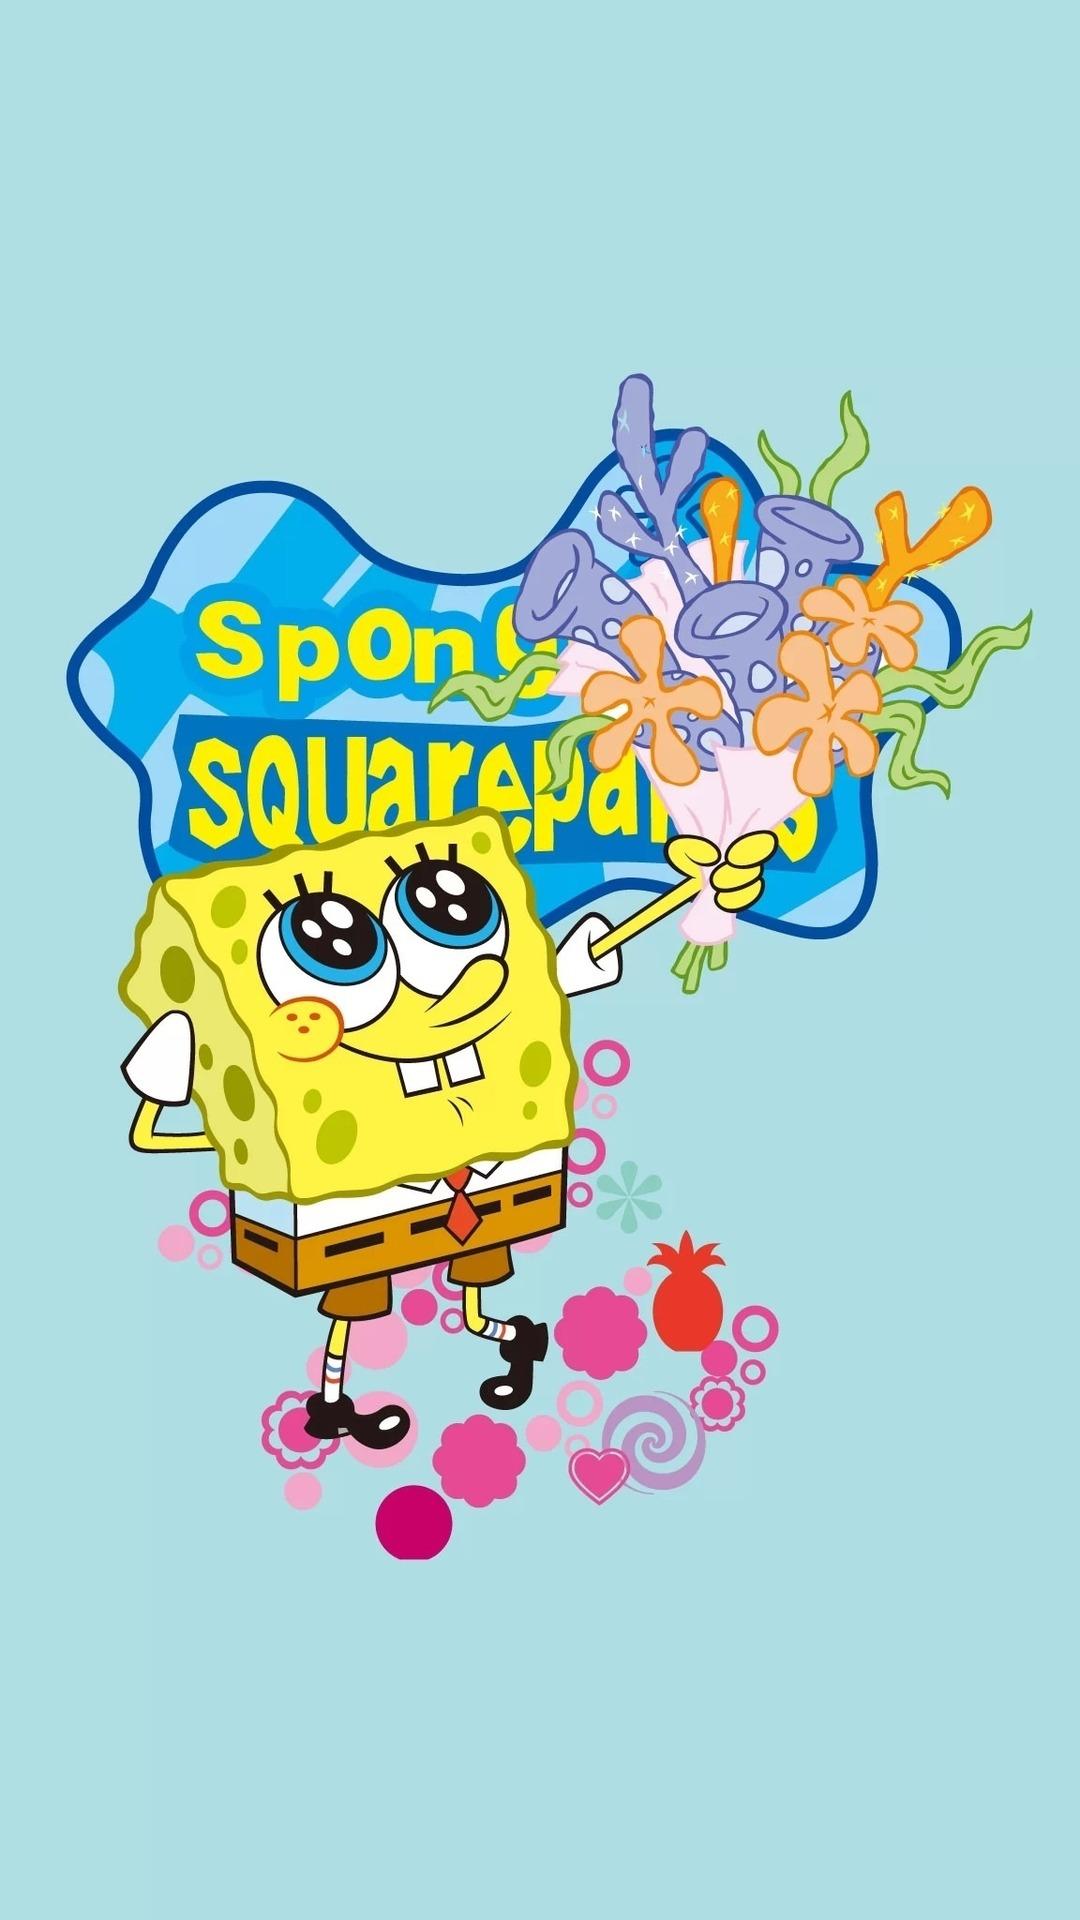 iseeyourelost spongebob squarepants wallpaper for android 3